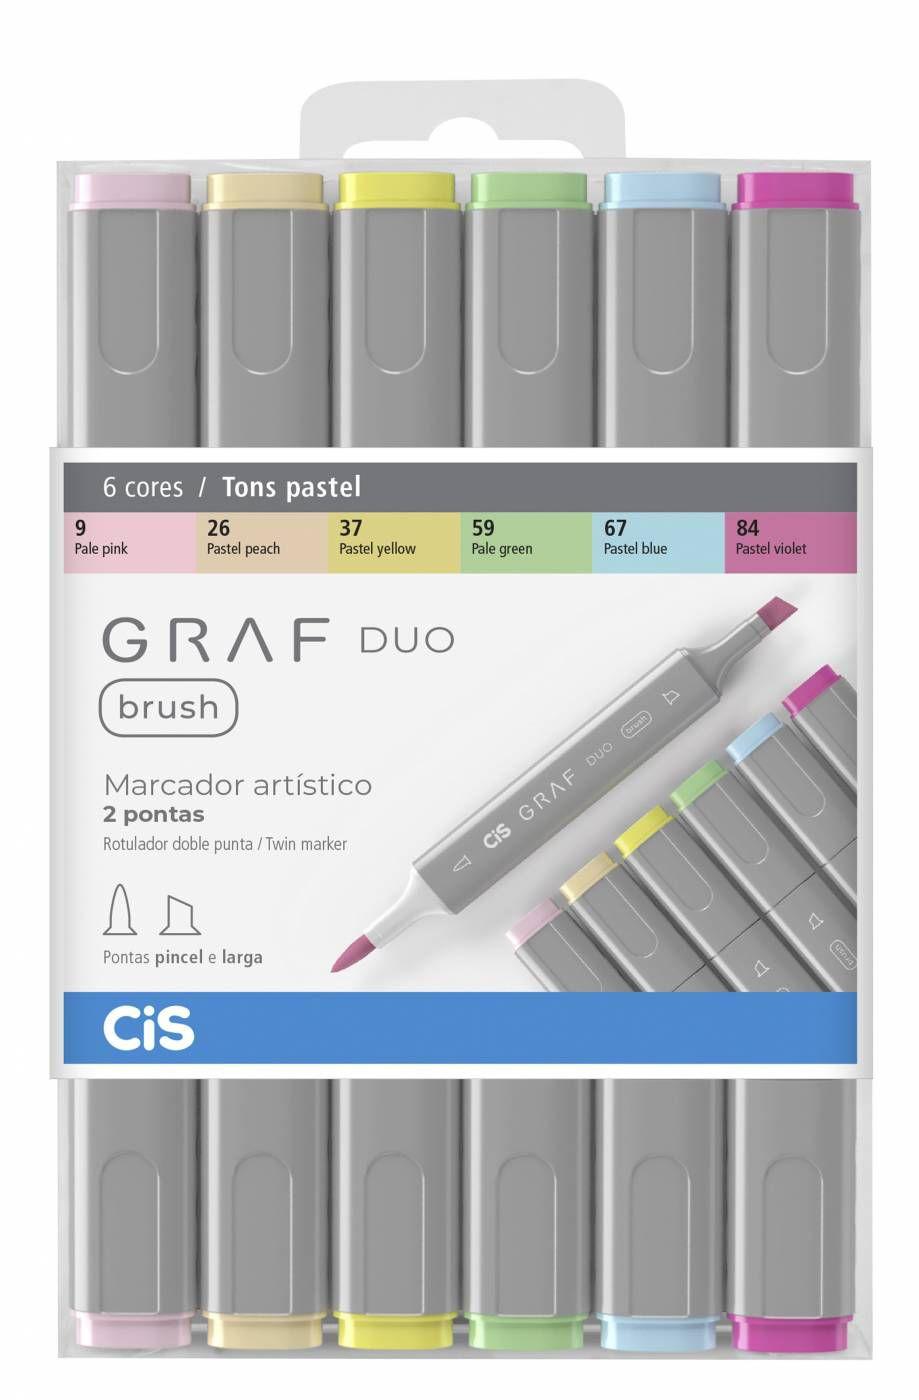 Caneta Marcador Graf Duo Brush Pastel